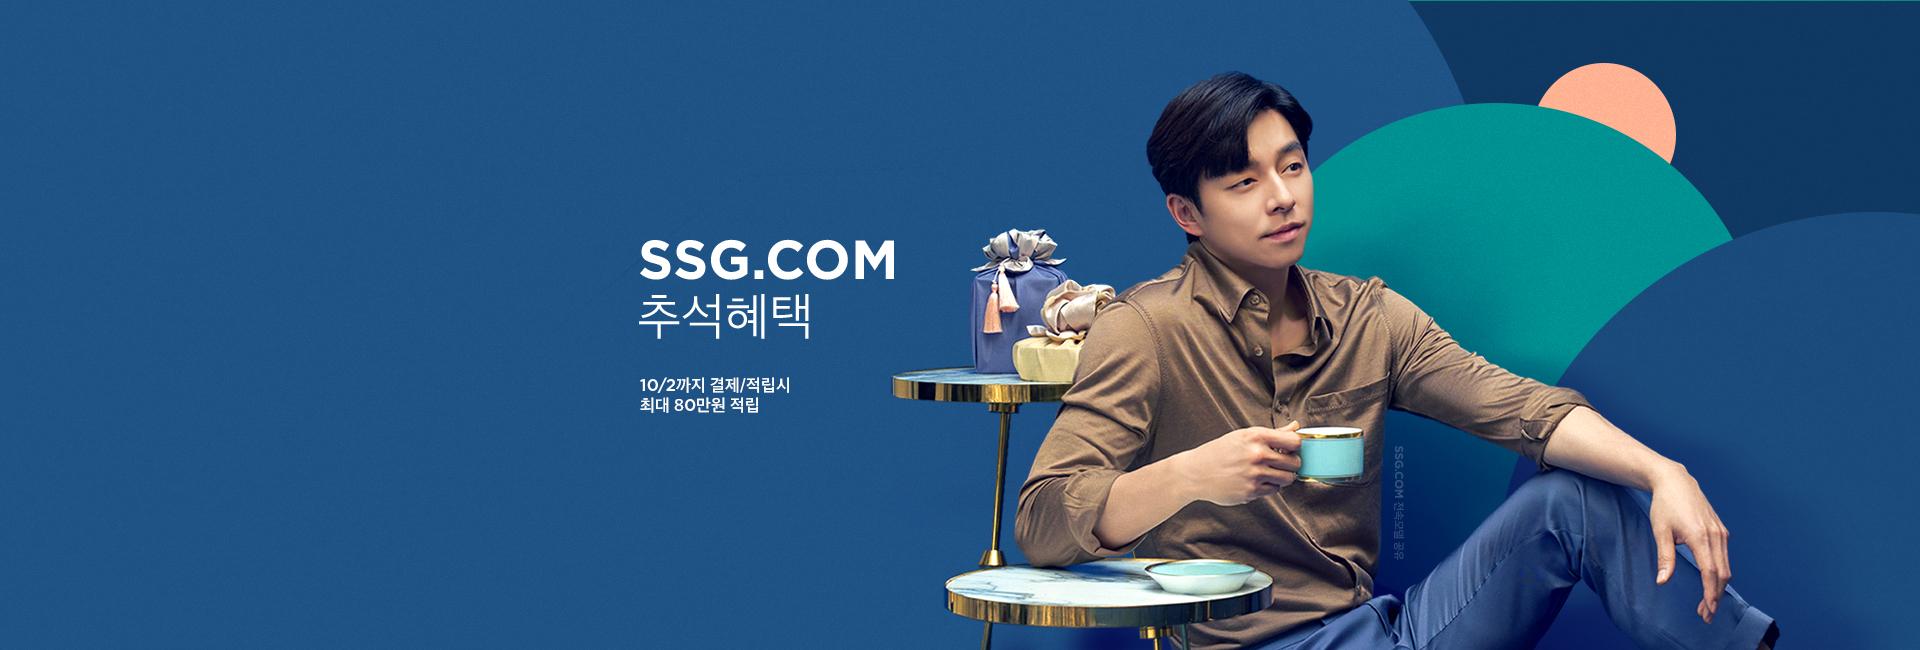 SSG.COM 추석혜택